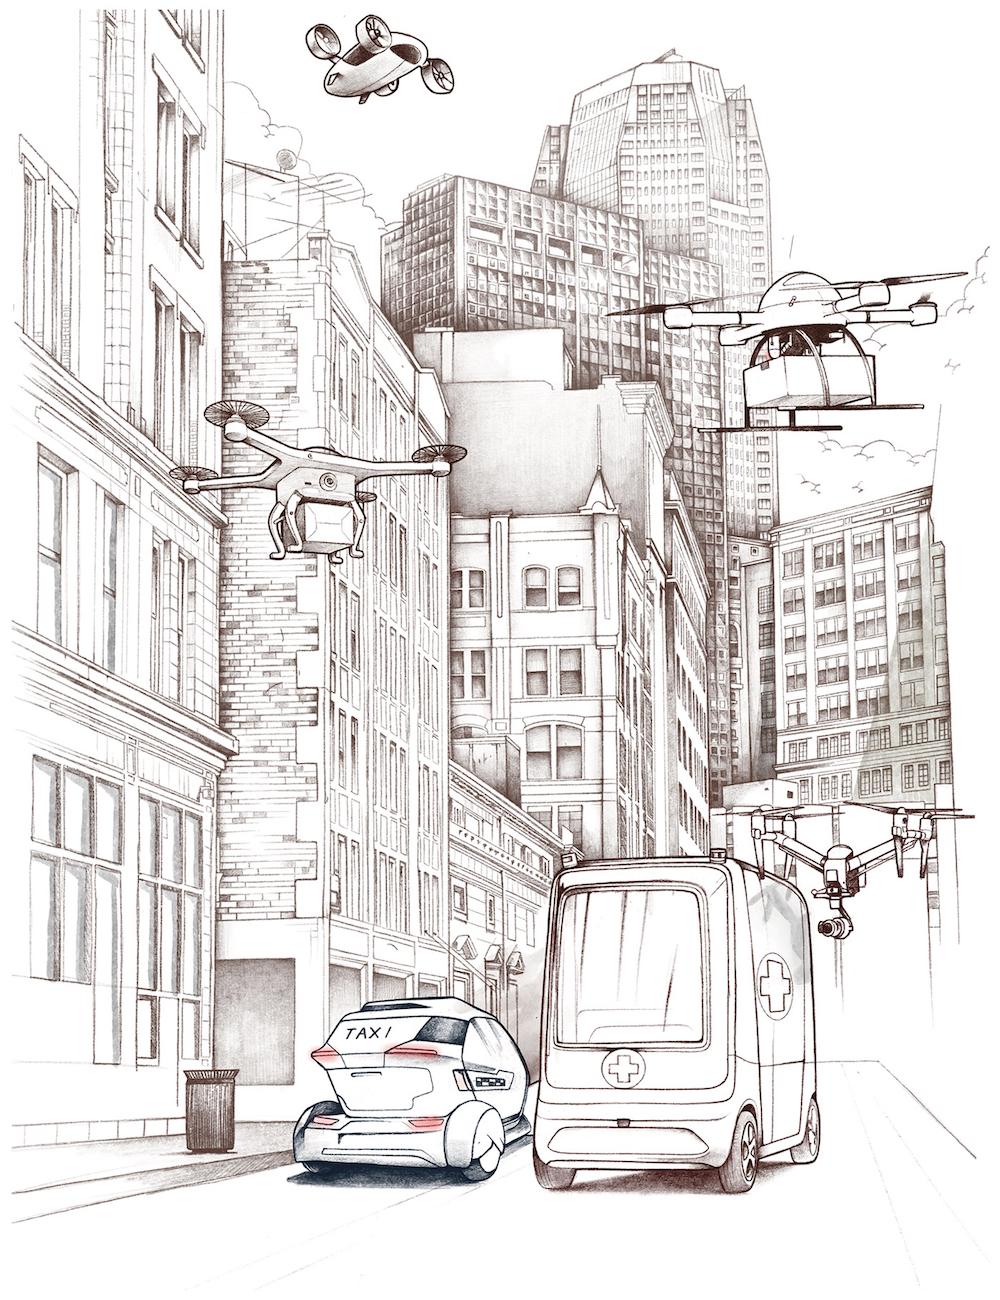 Retina magazine cover Oscar Llorens leManoosh industrial design blog and online courses